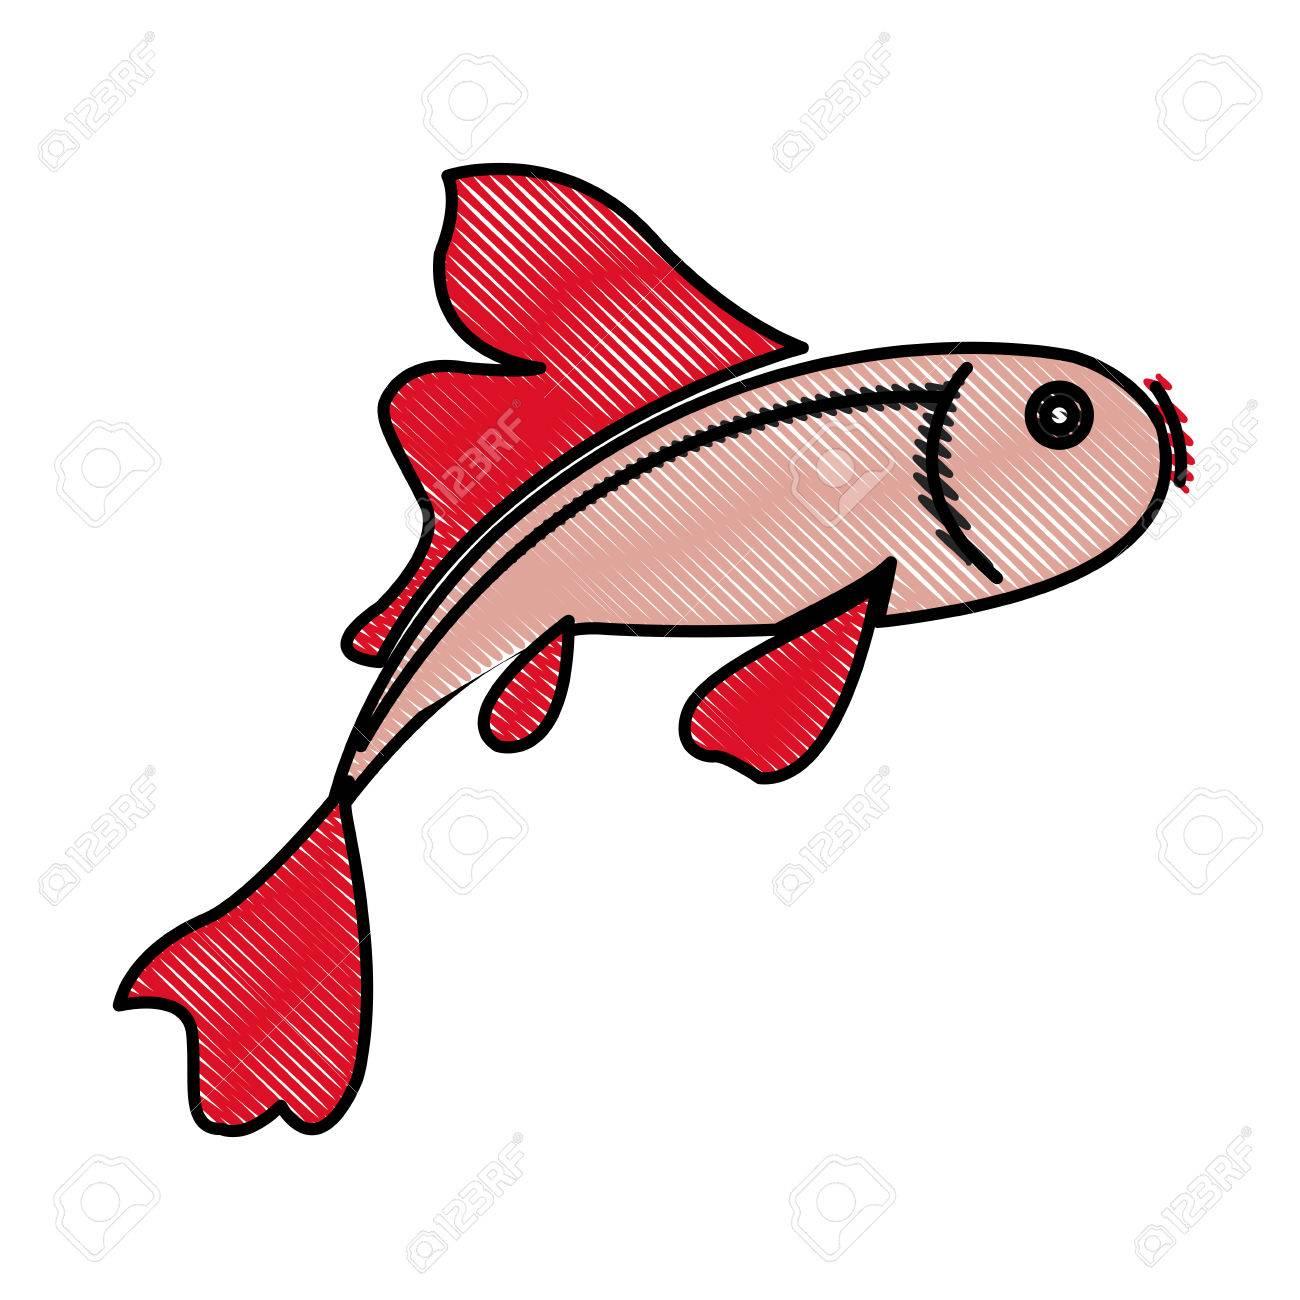 Drawing Fish Koi Chinese Animal Asian Decorative Vector Illustration ...